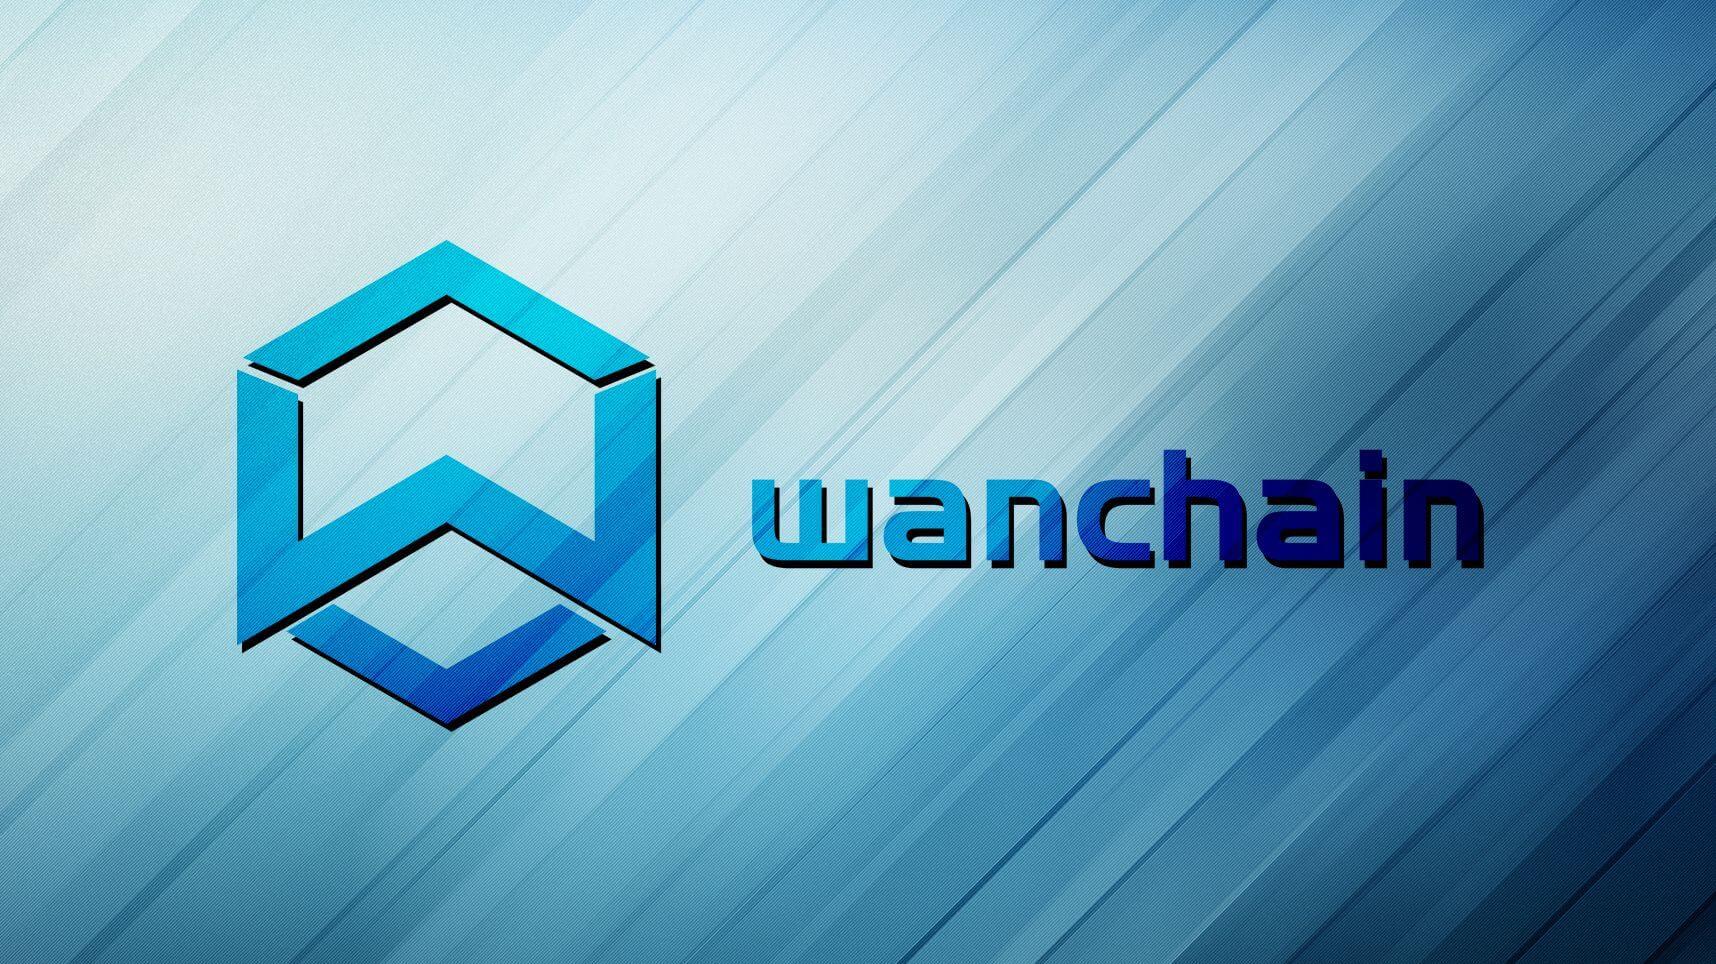 معرفی شبکه wanchain